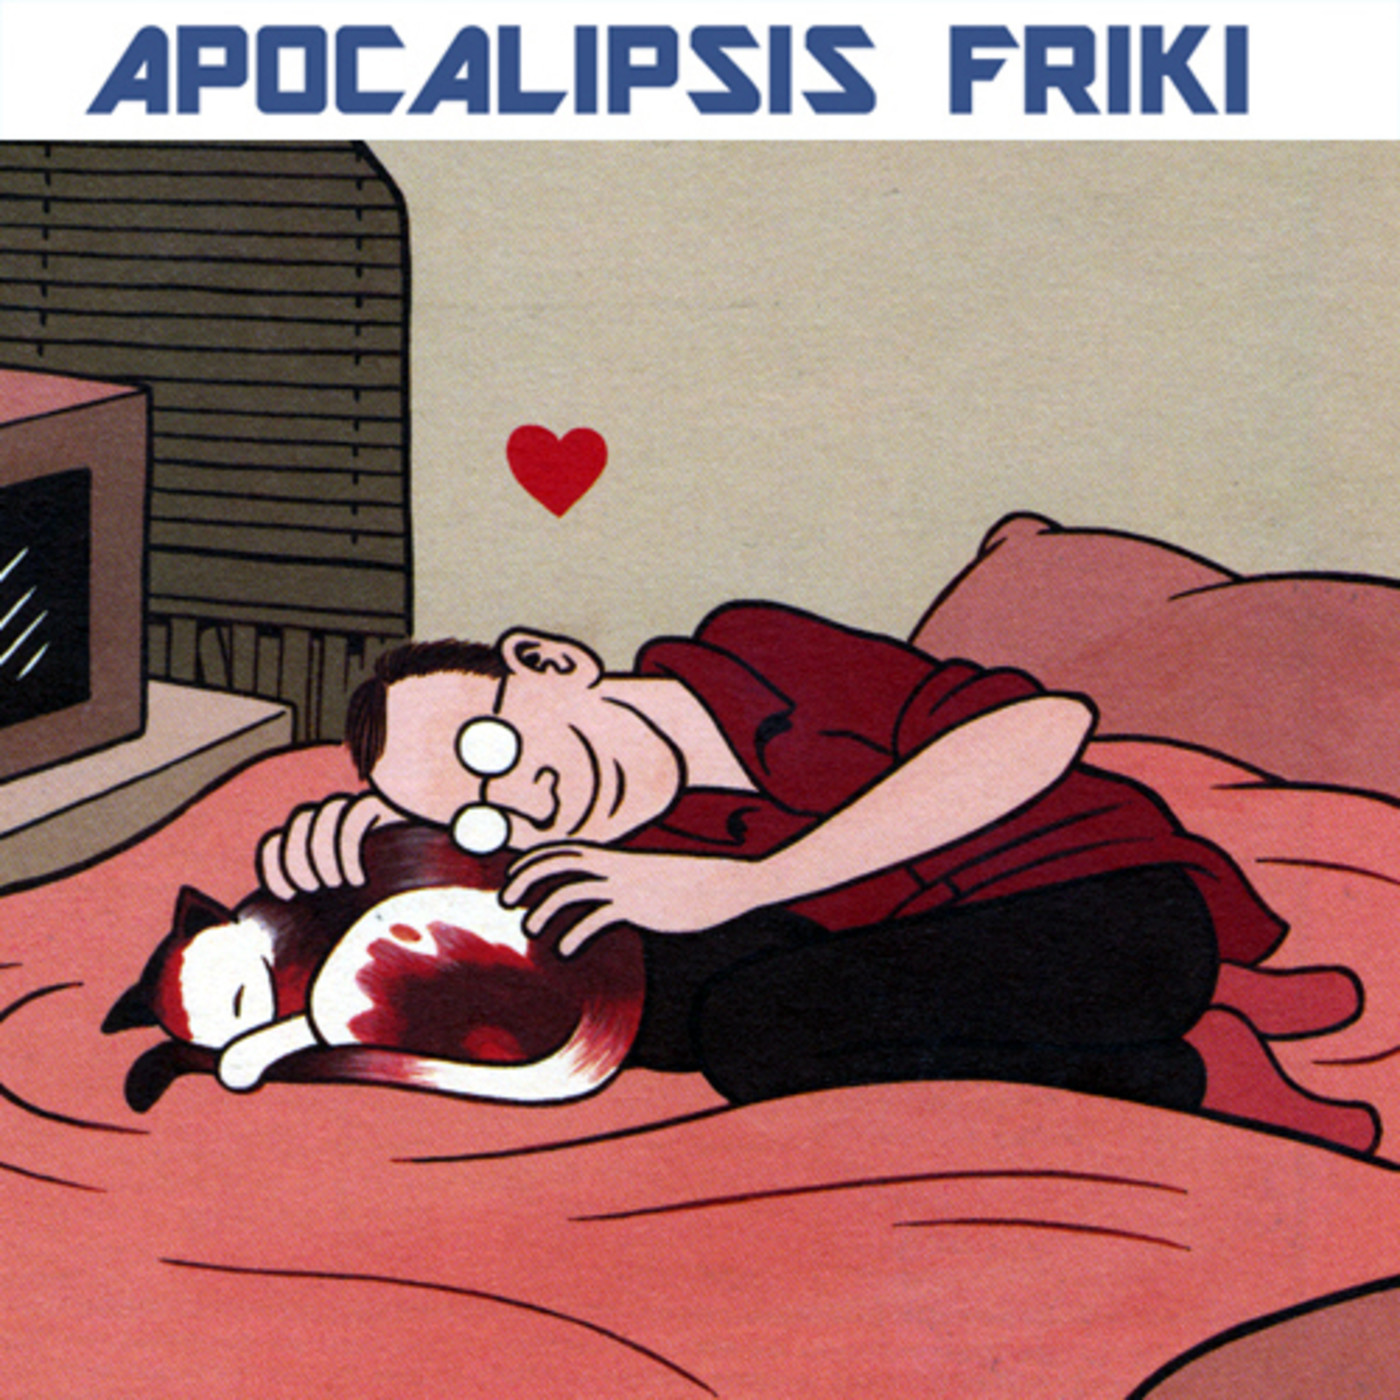 Apocalipsis Friki 074 - Especial Cómic Autobiográfico: 12 Autores